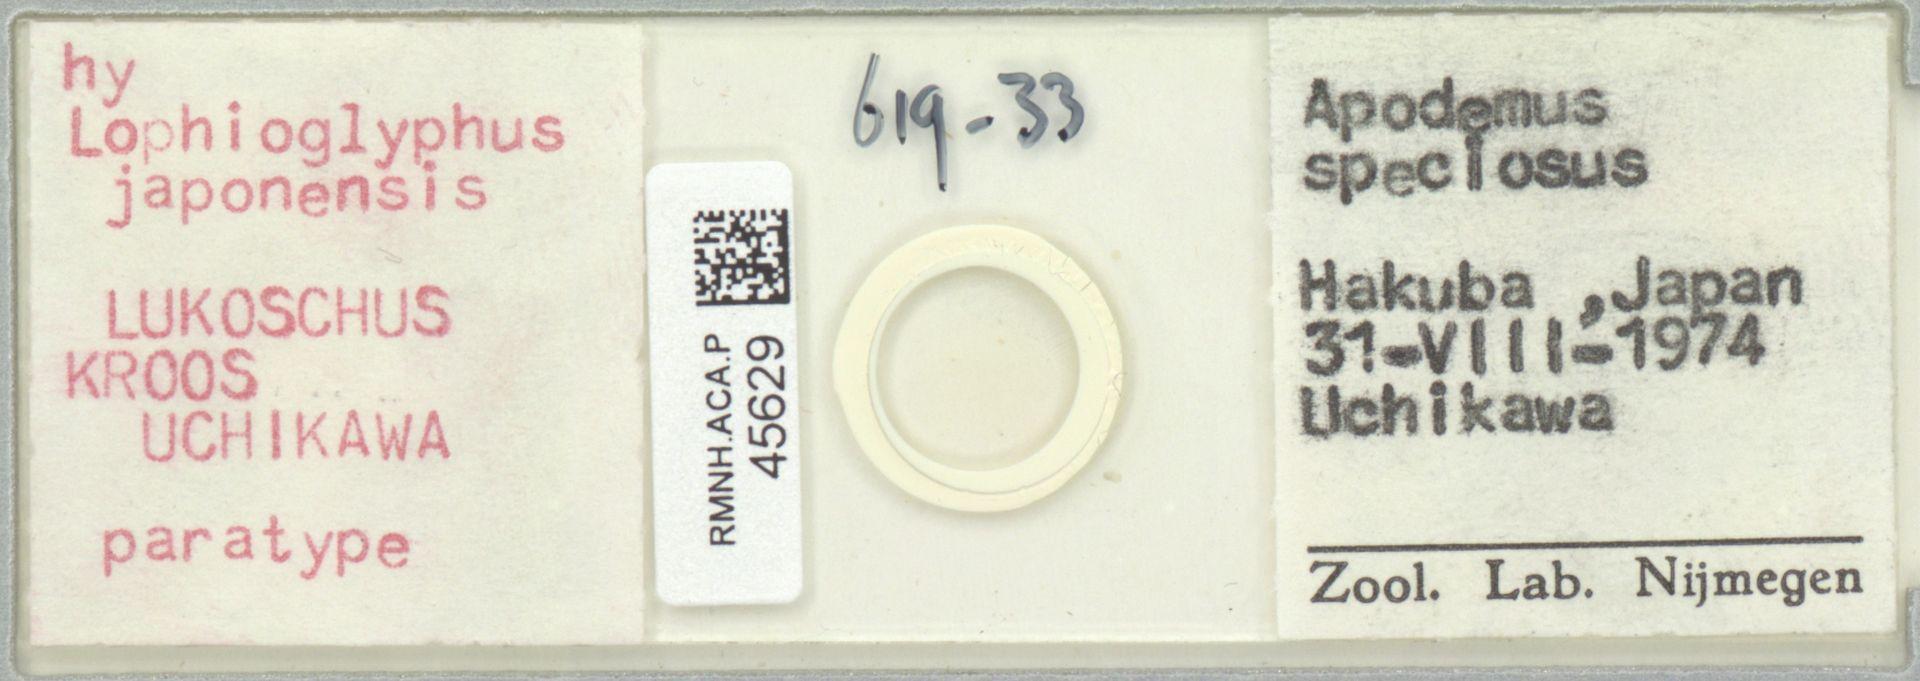 RMNH.ACA.P.45629 | Lophioglyphus japonensis Lukoschus, Kroos, Uchikawa